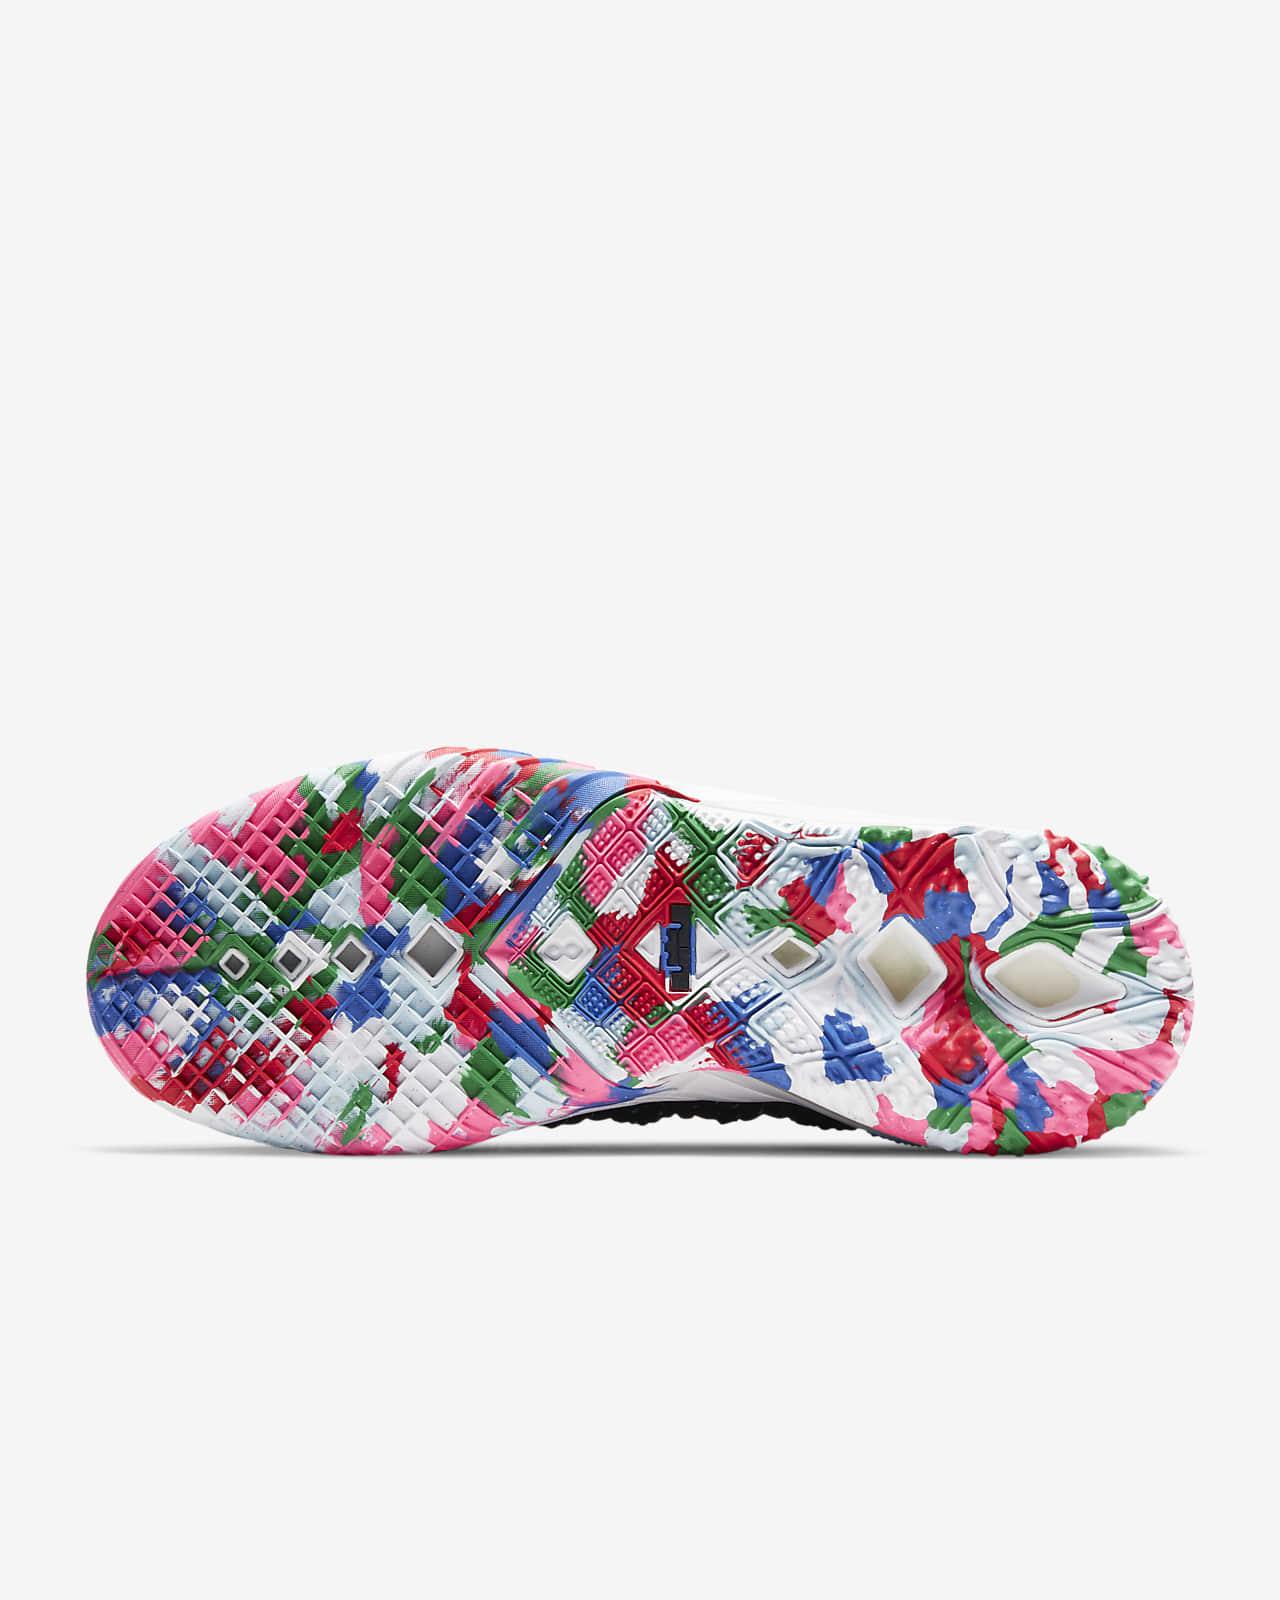 nike lebron multicolor shoes